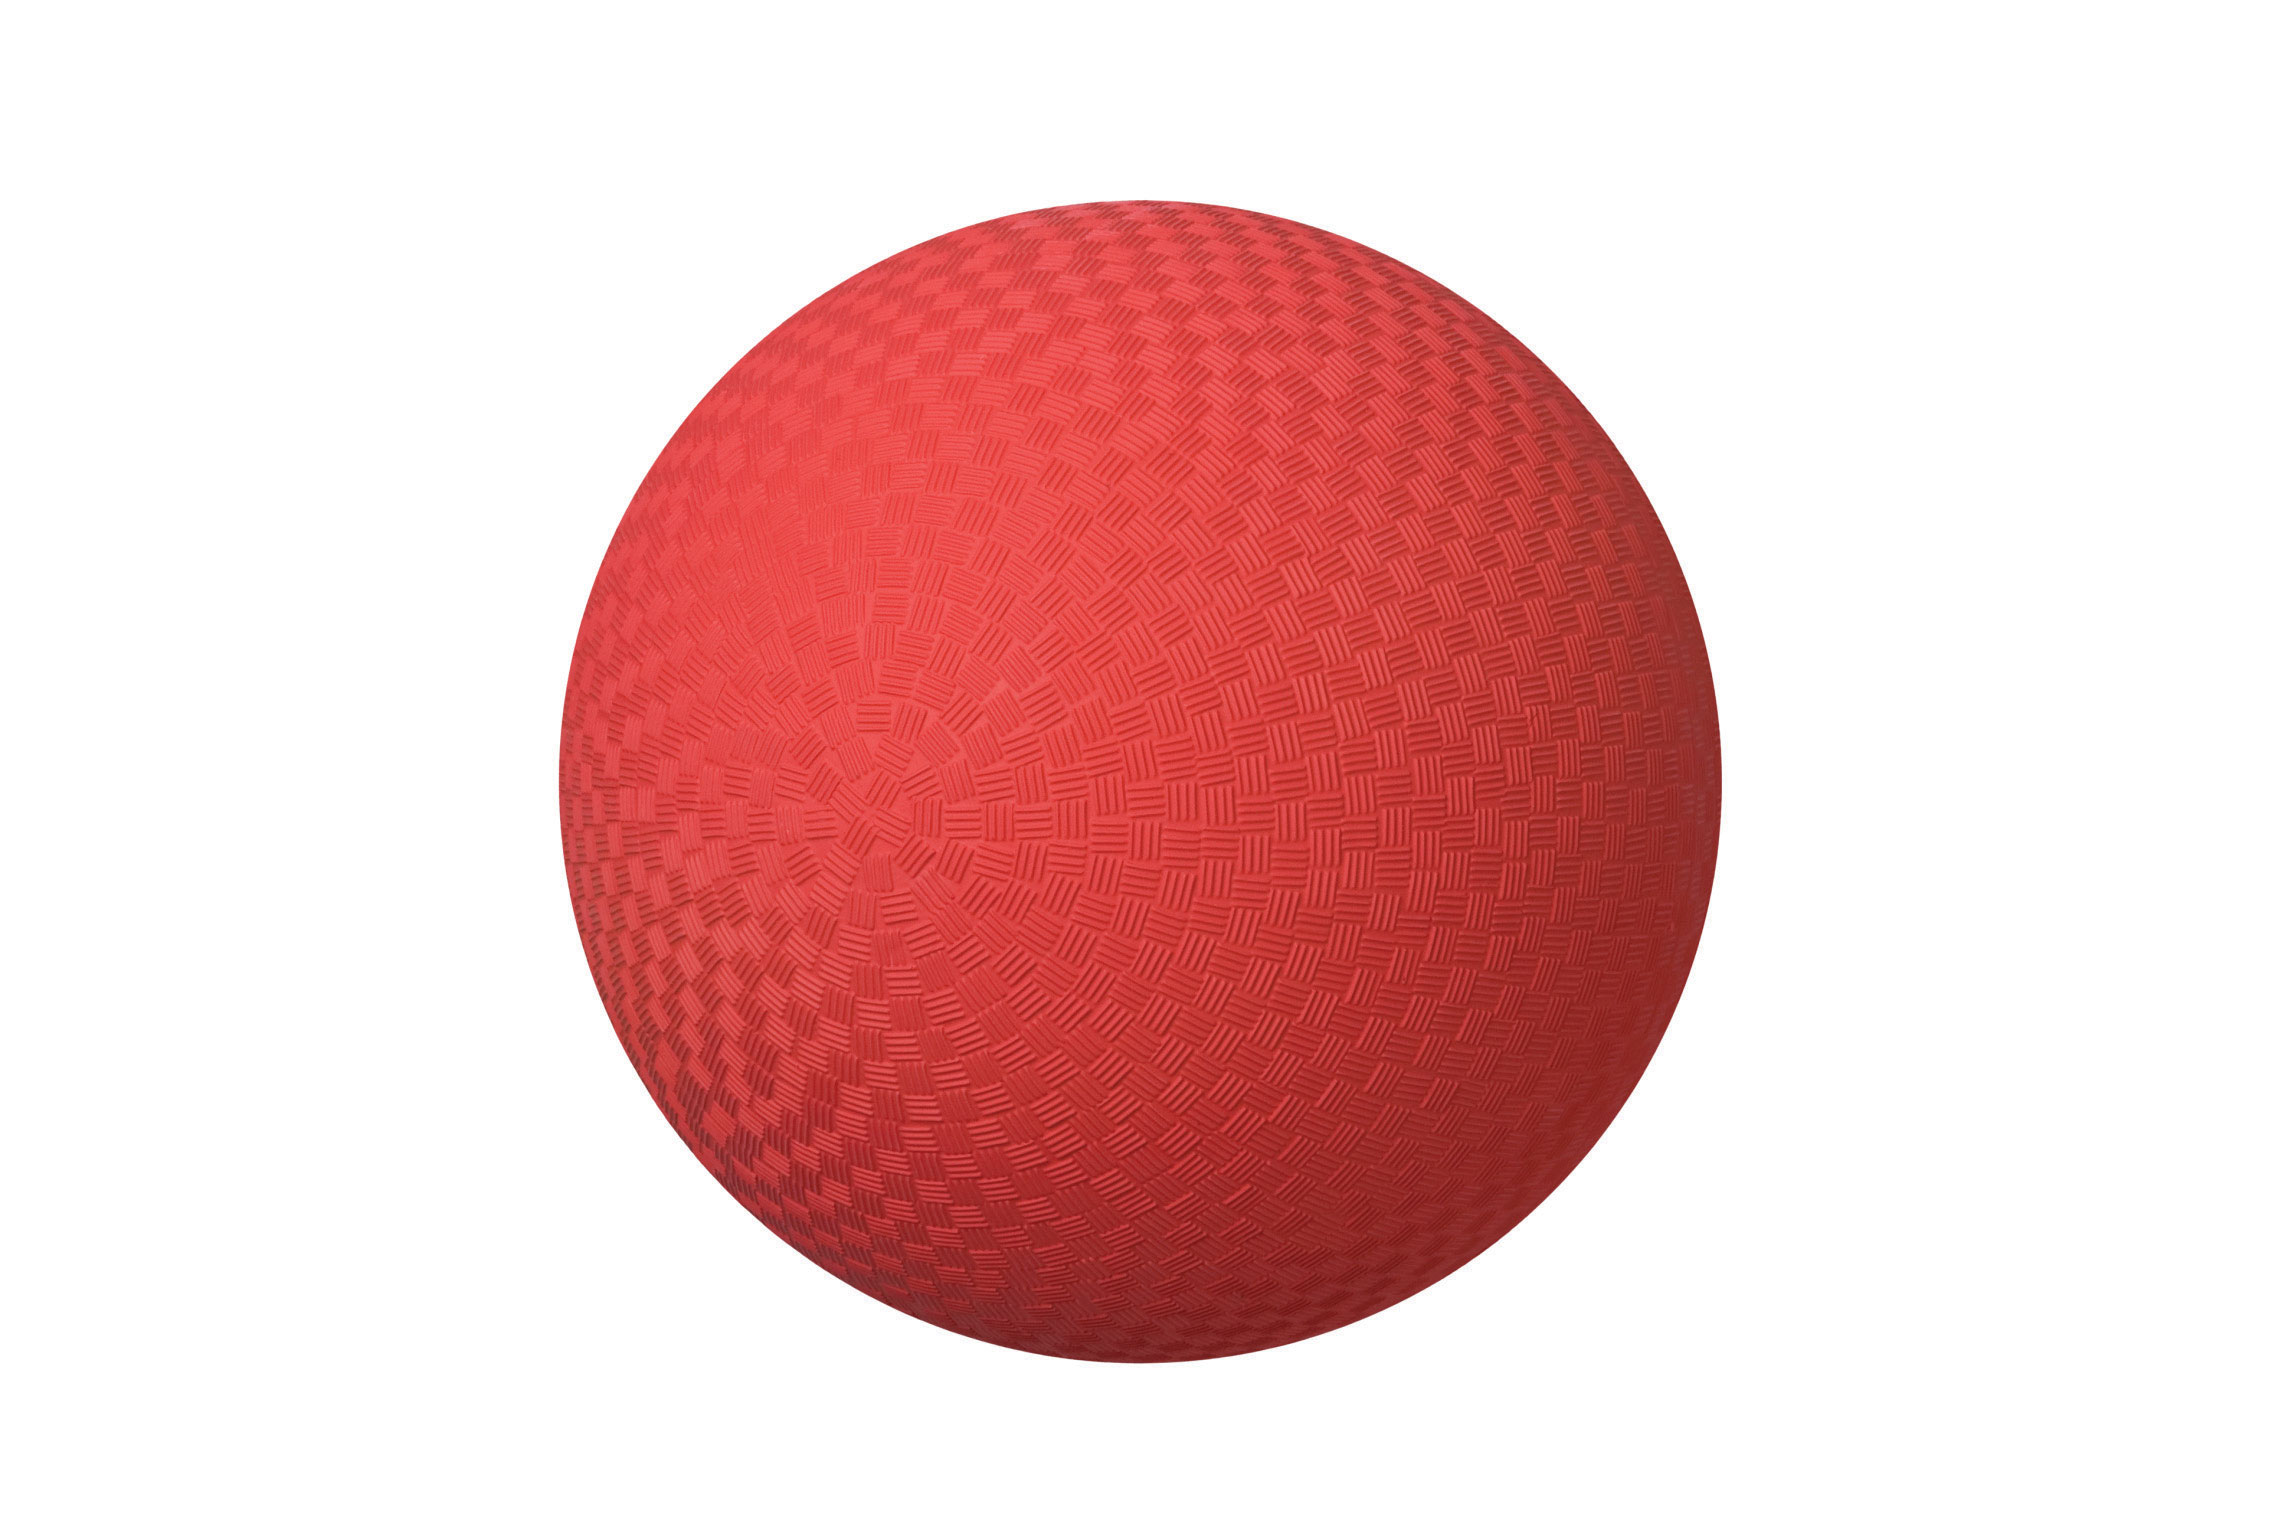 Free Free Kickball Cliparts, Download Free Clip Art, Free Clip Art.